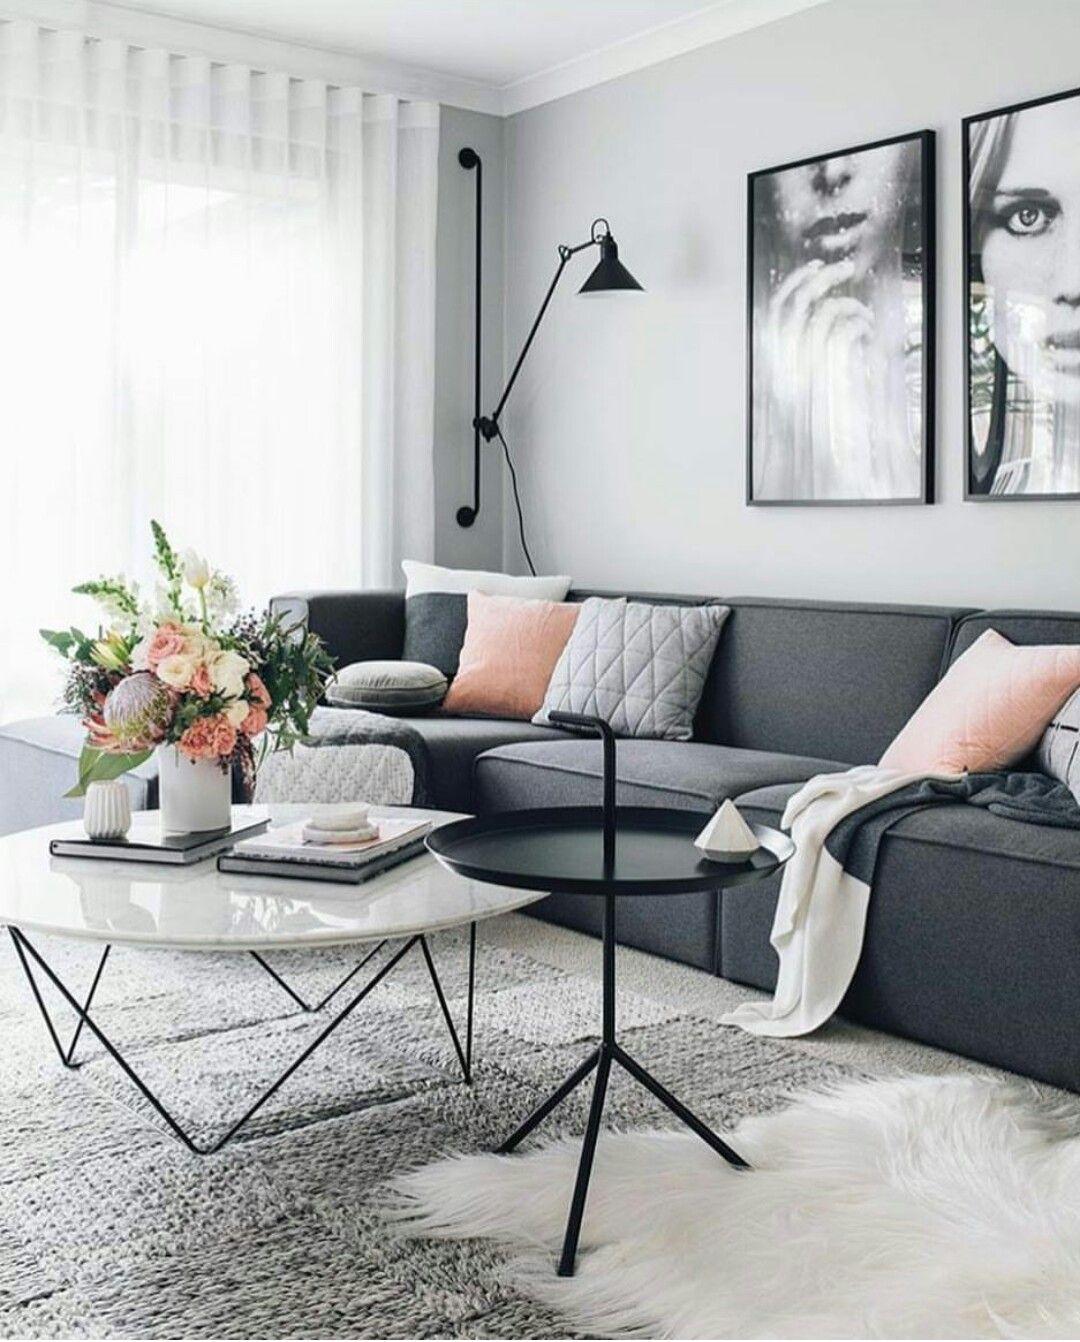 pinzozorana on living room | pinterest | living rooms, room